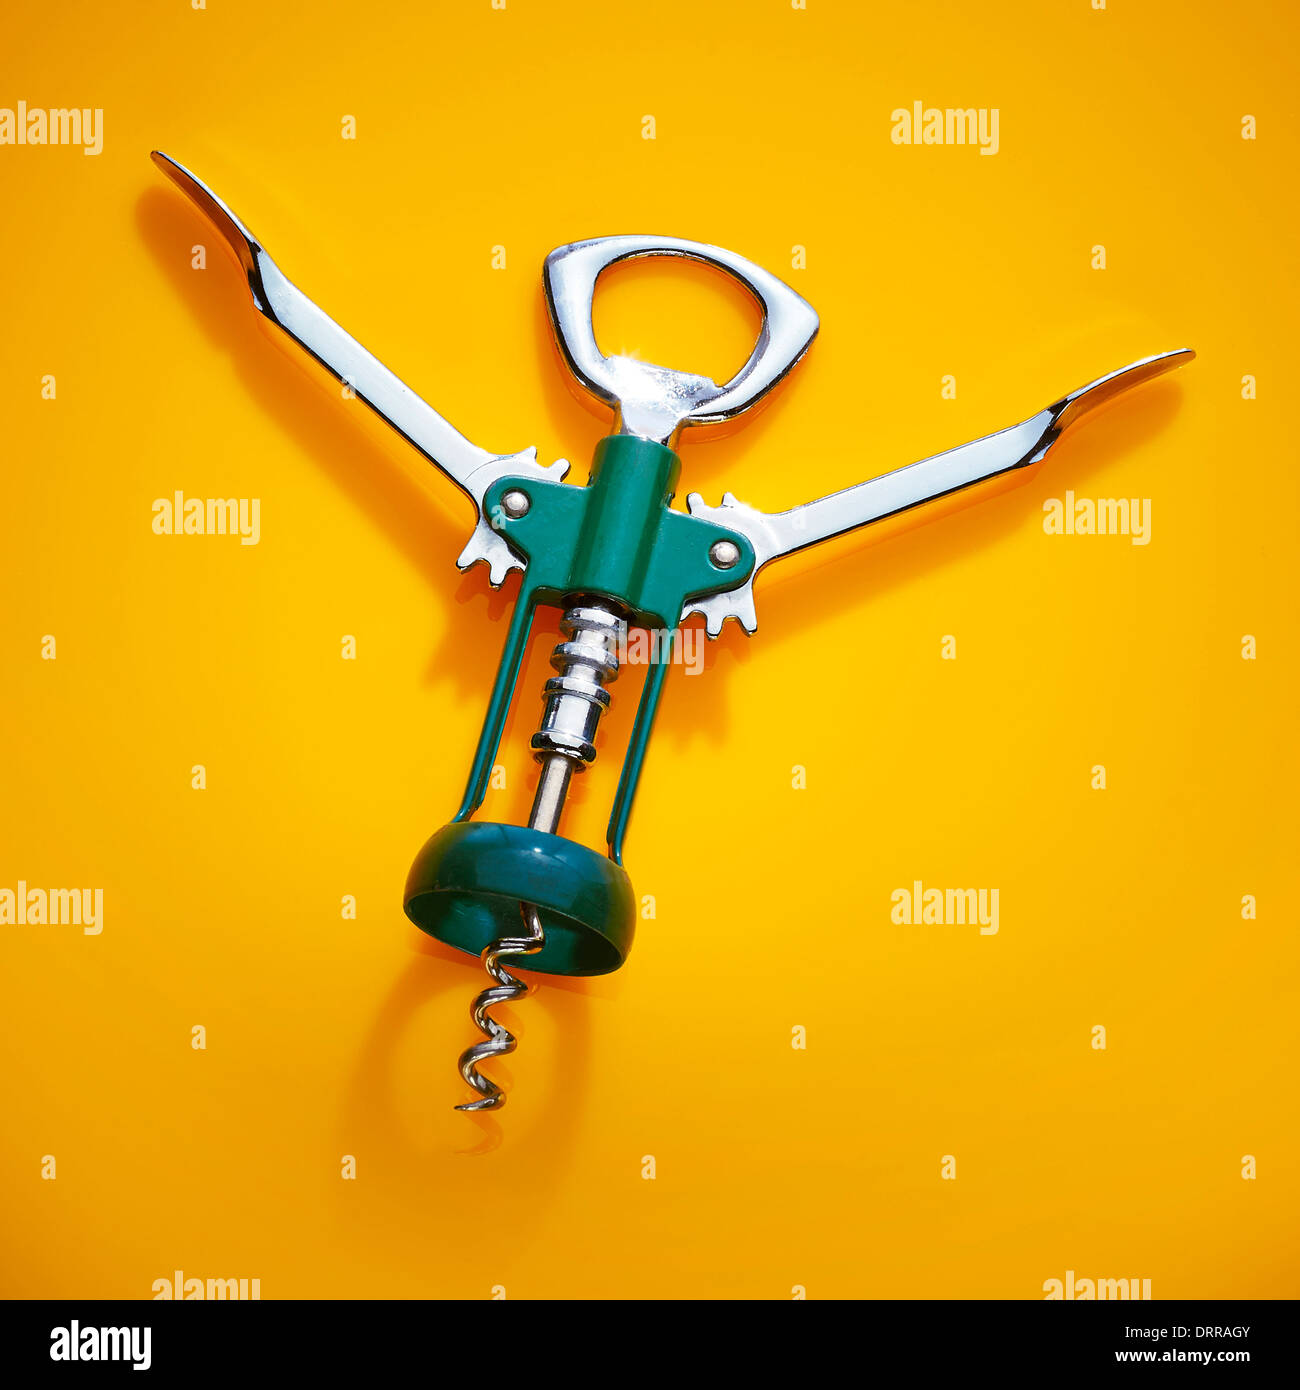 Chrome wine bottle opener on a yellow background - Stock Image